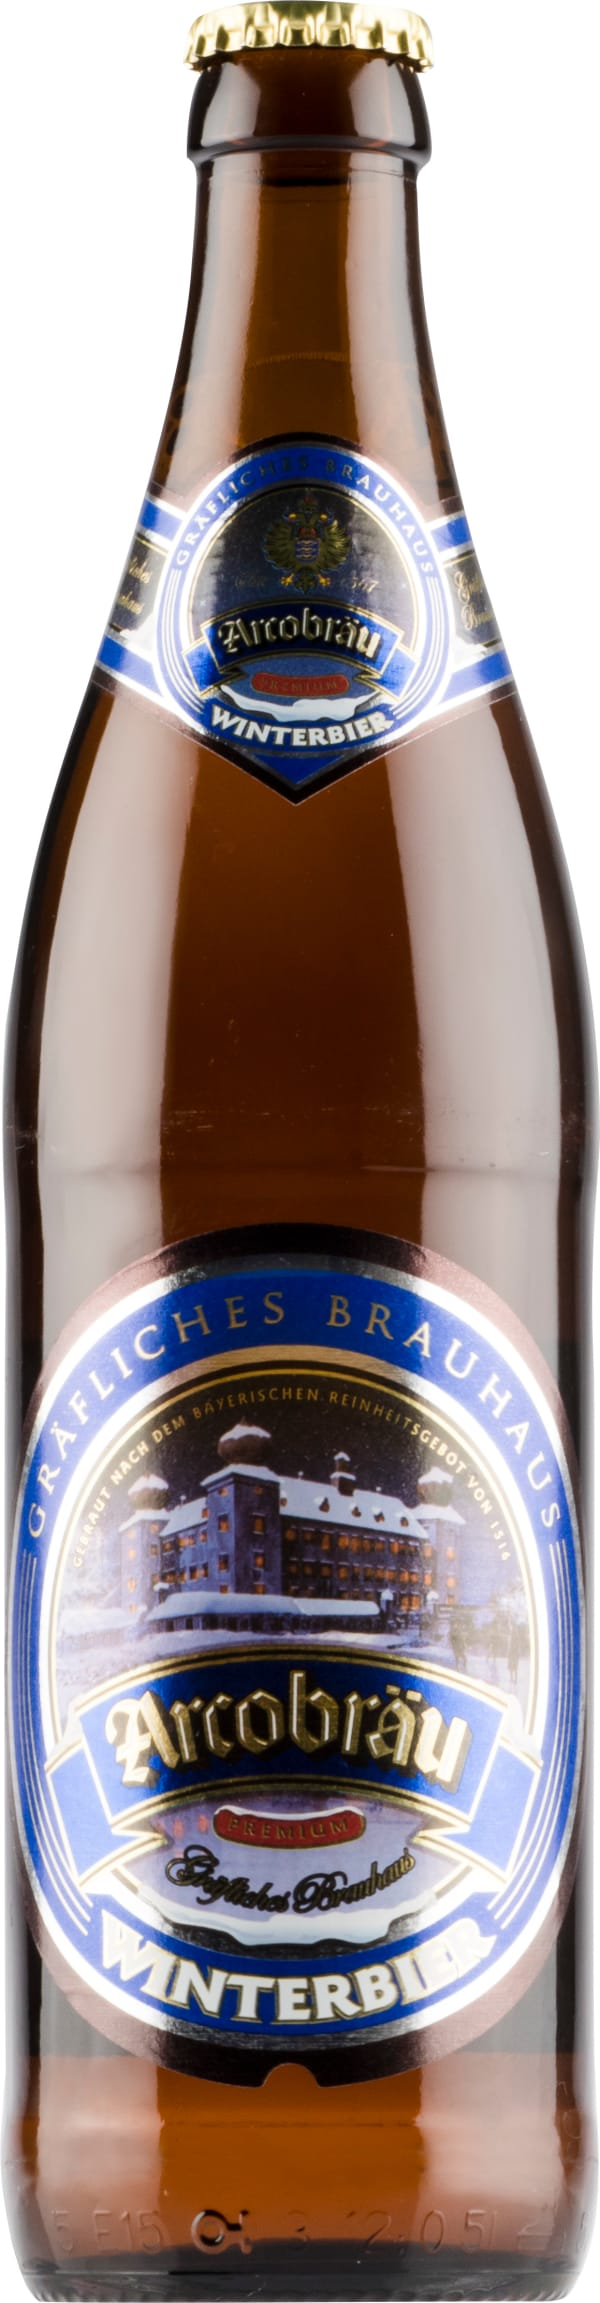 Arcobräu Winterbier